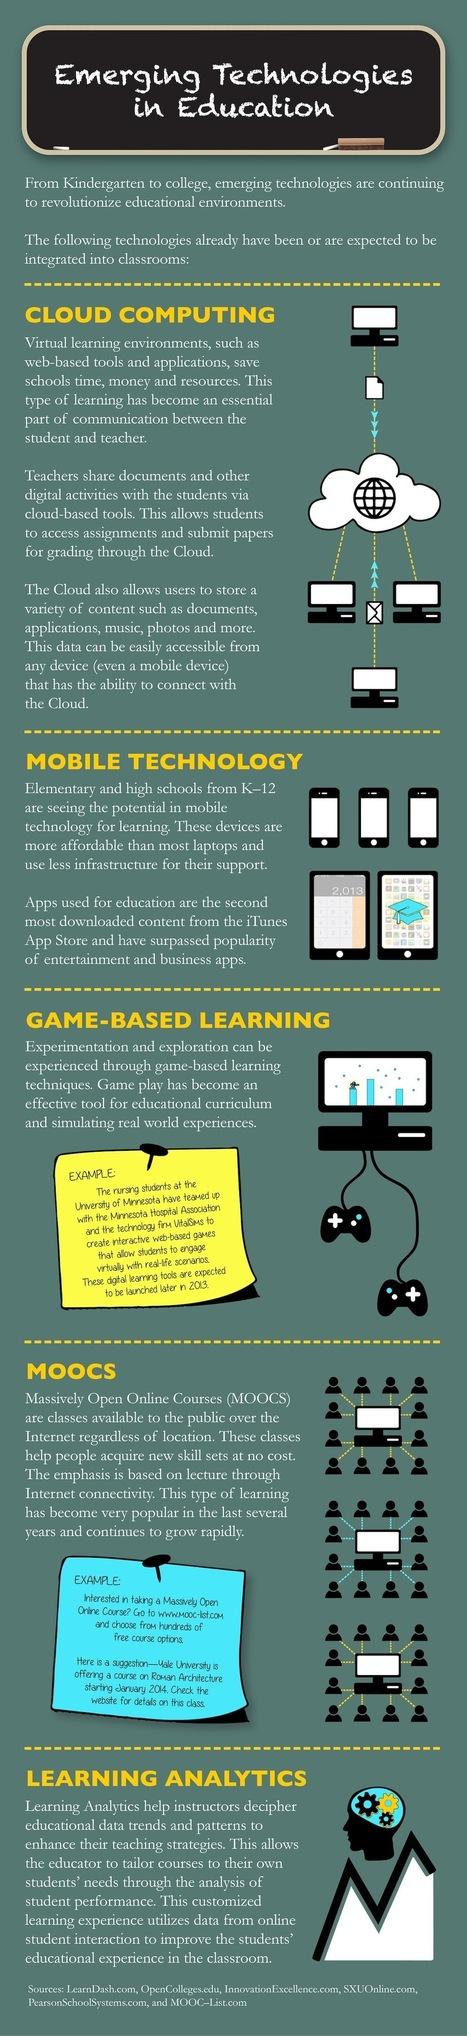 TΟΠ 5 Αναδυόμενων Τεχνολογιών στην Εκπαίδευση | soundsInteresting | Scoop.it